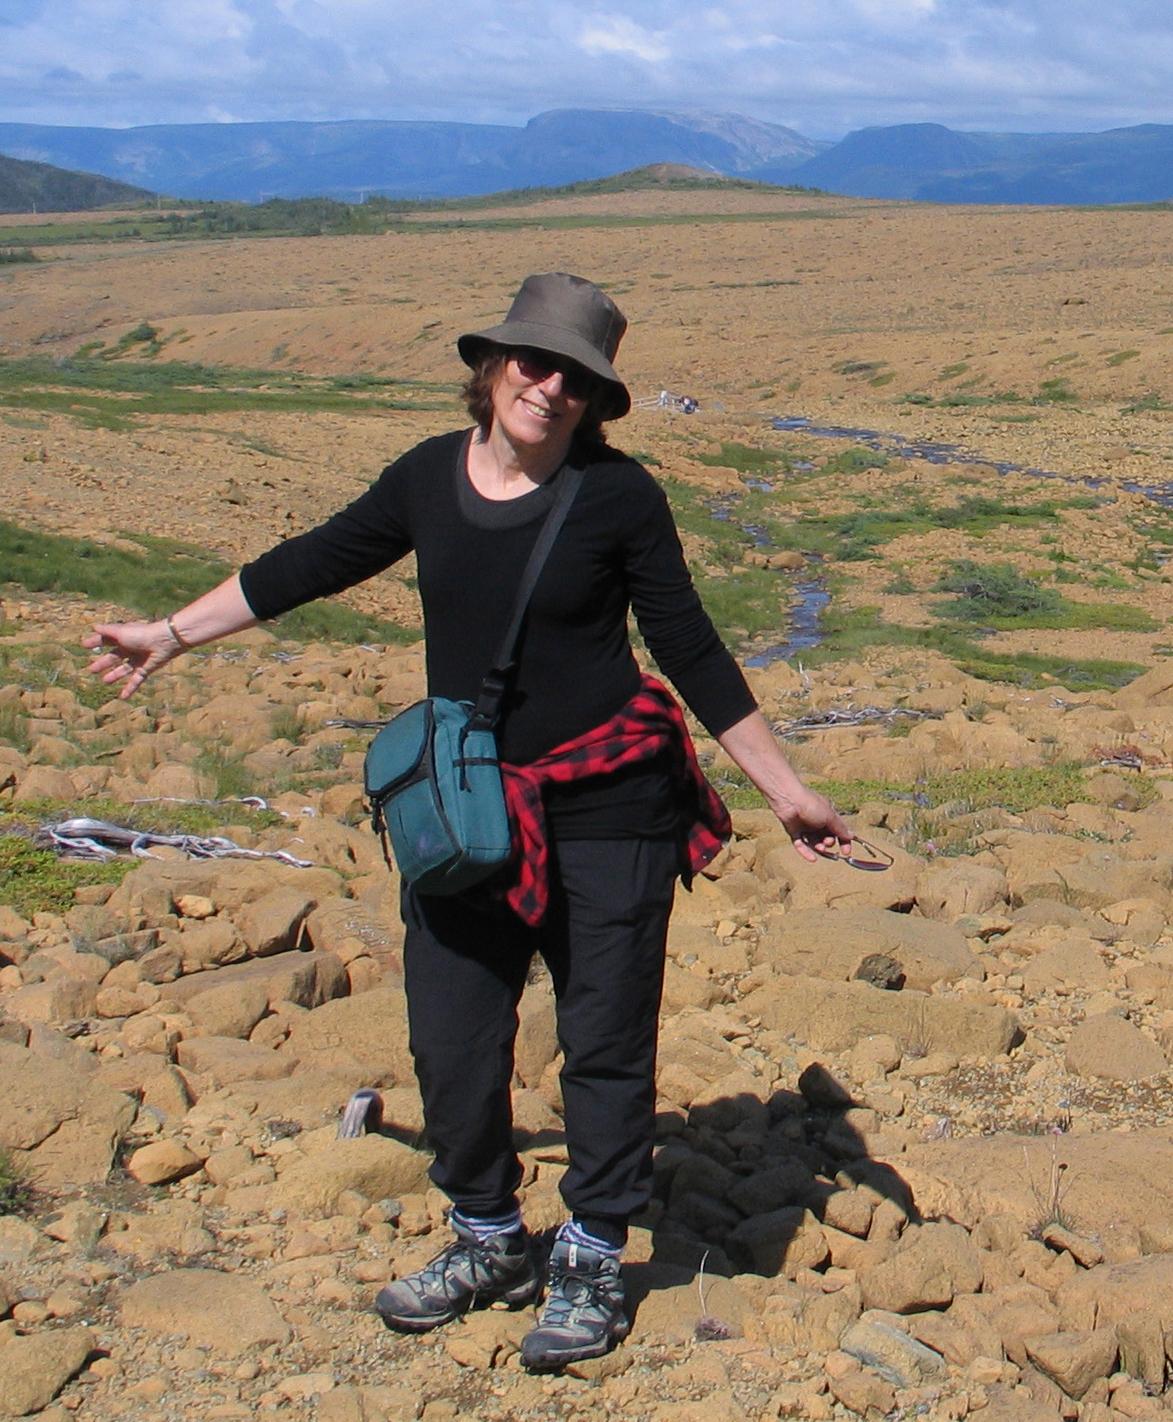 Miriam Garfinkle in the Tablelands, Gros Morne - Photo by Ulli Diemer